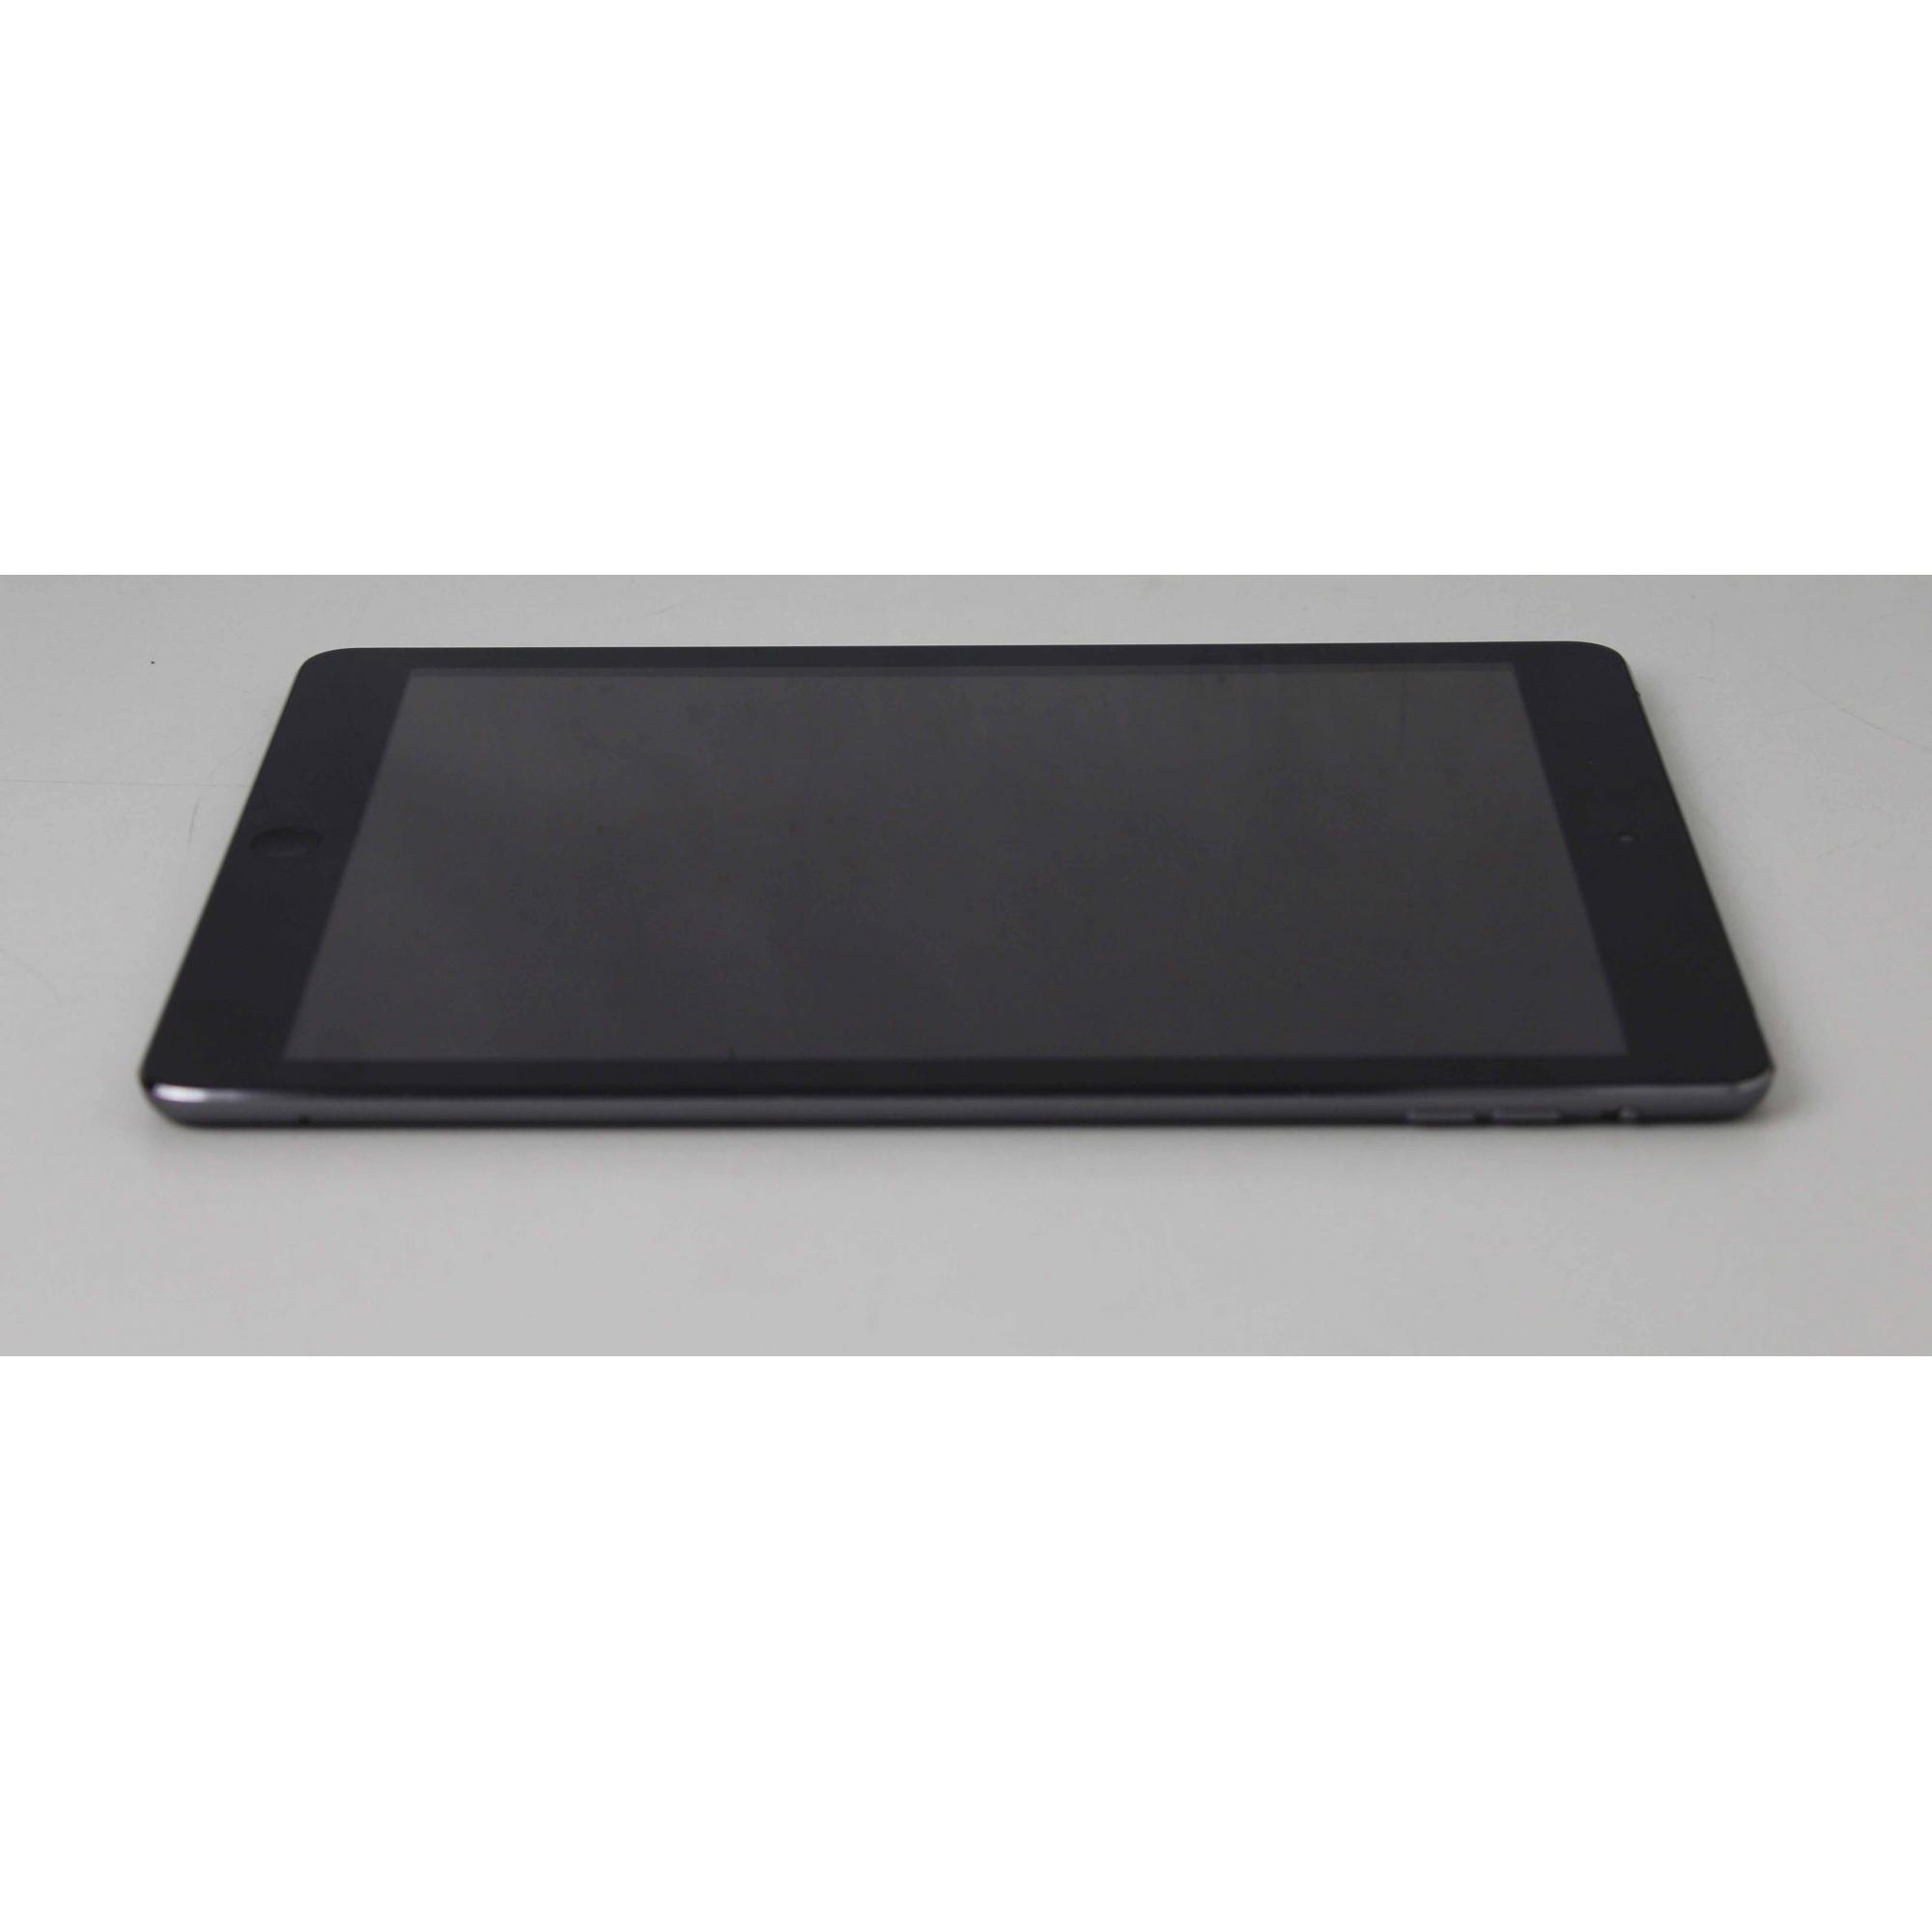 "iPad Air MD792BR/A 9.7"" 32GB Wifi + 4G - Cinza espacial"